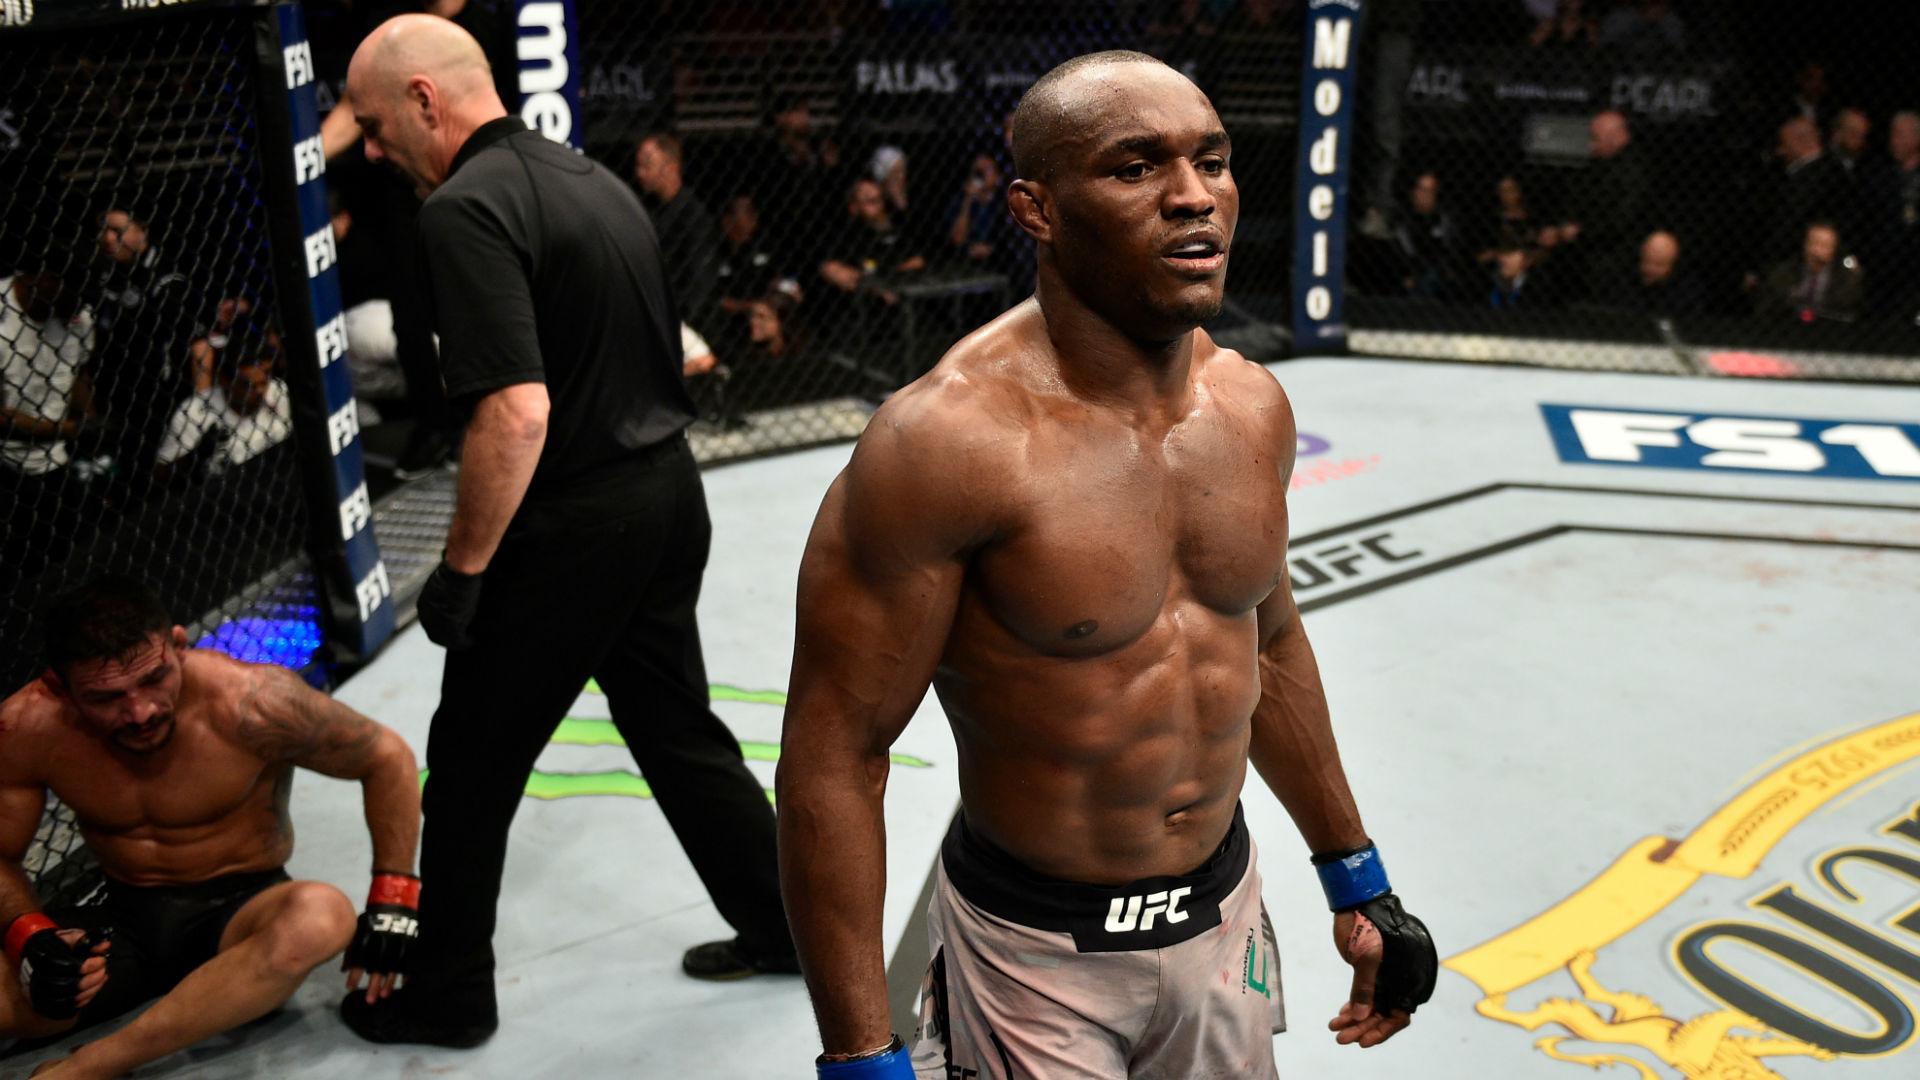 UFC 251 on Fight Island date, start time, card, schedule & odds for Kamaru Usman vs. Jorge Masvidal